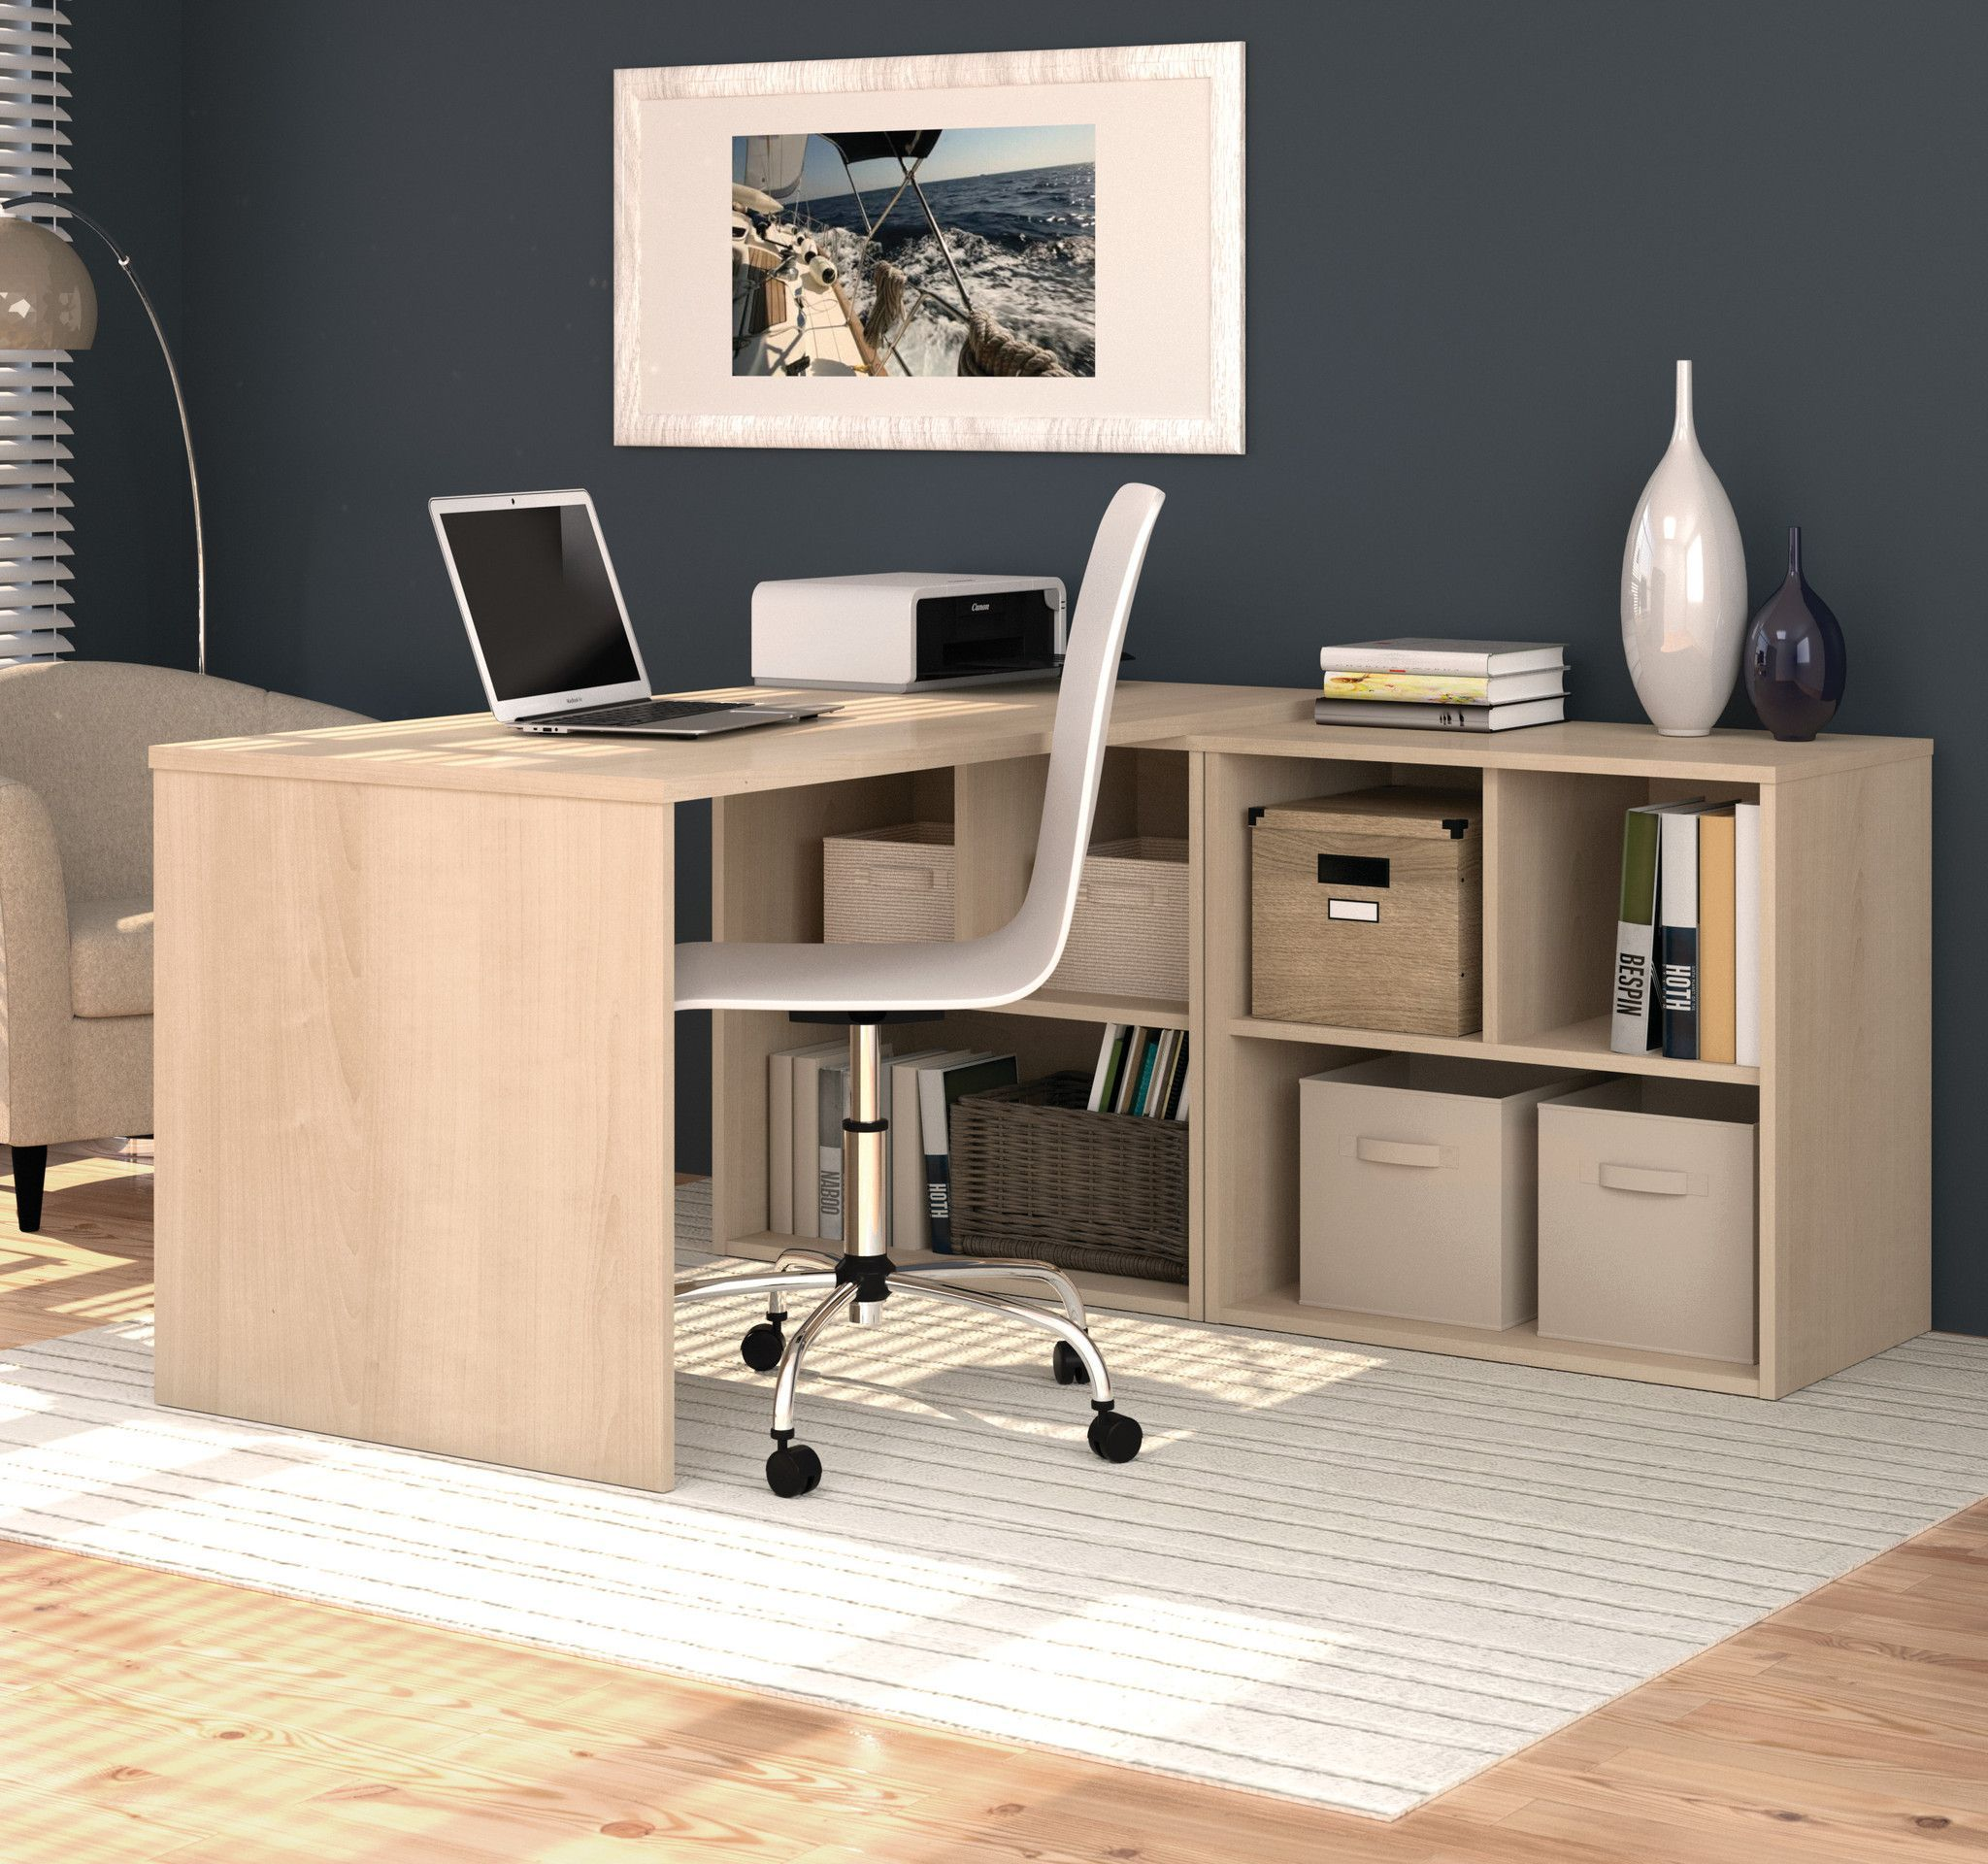 elegant northern maple l shaped office desk with built in storage shelves office ideas. Black Bedroom Furniture Sets. Home Design Ideas